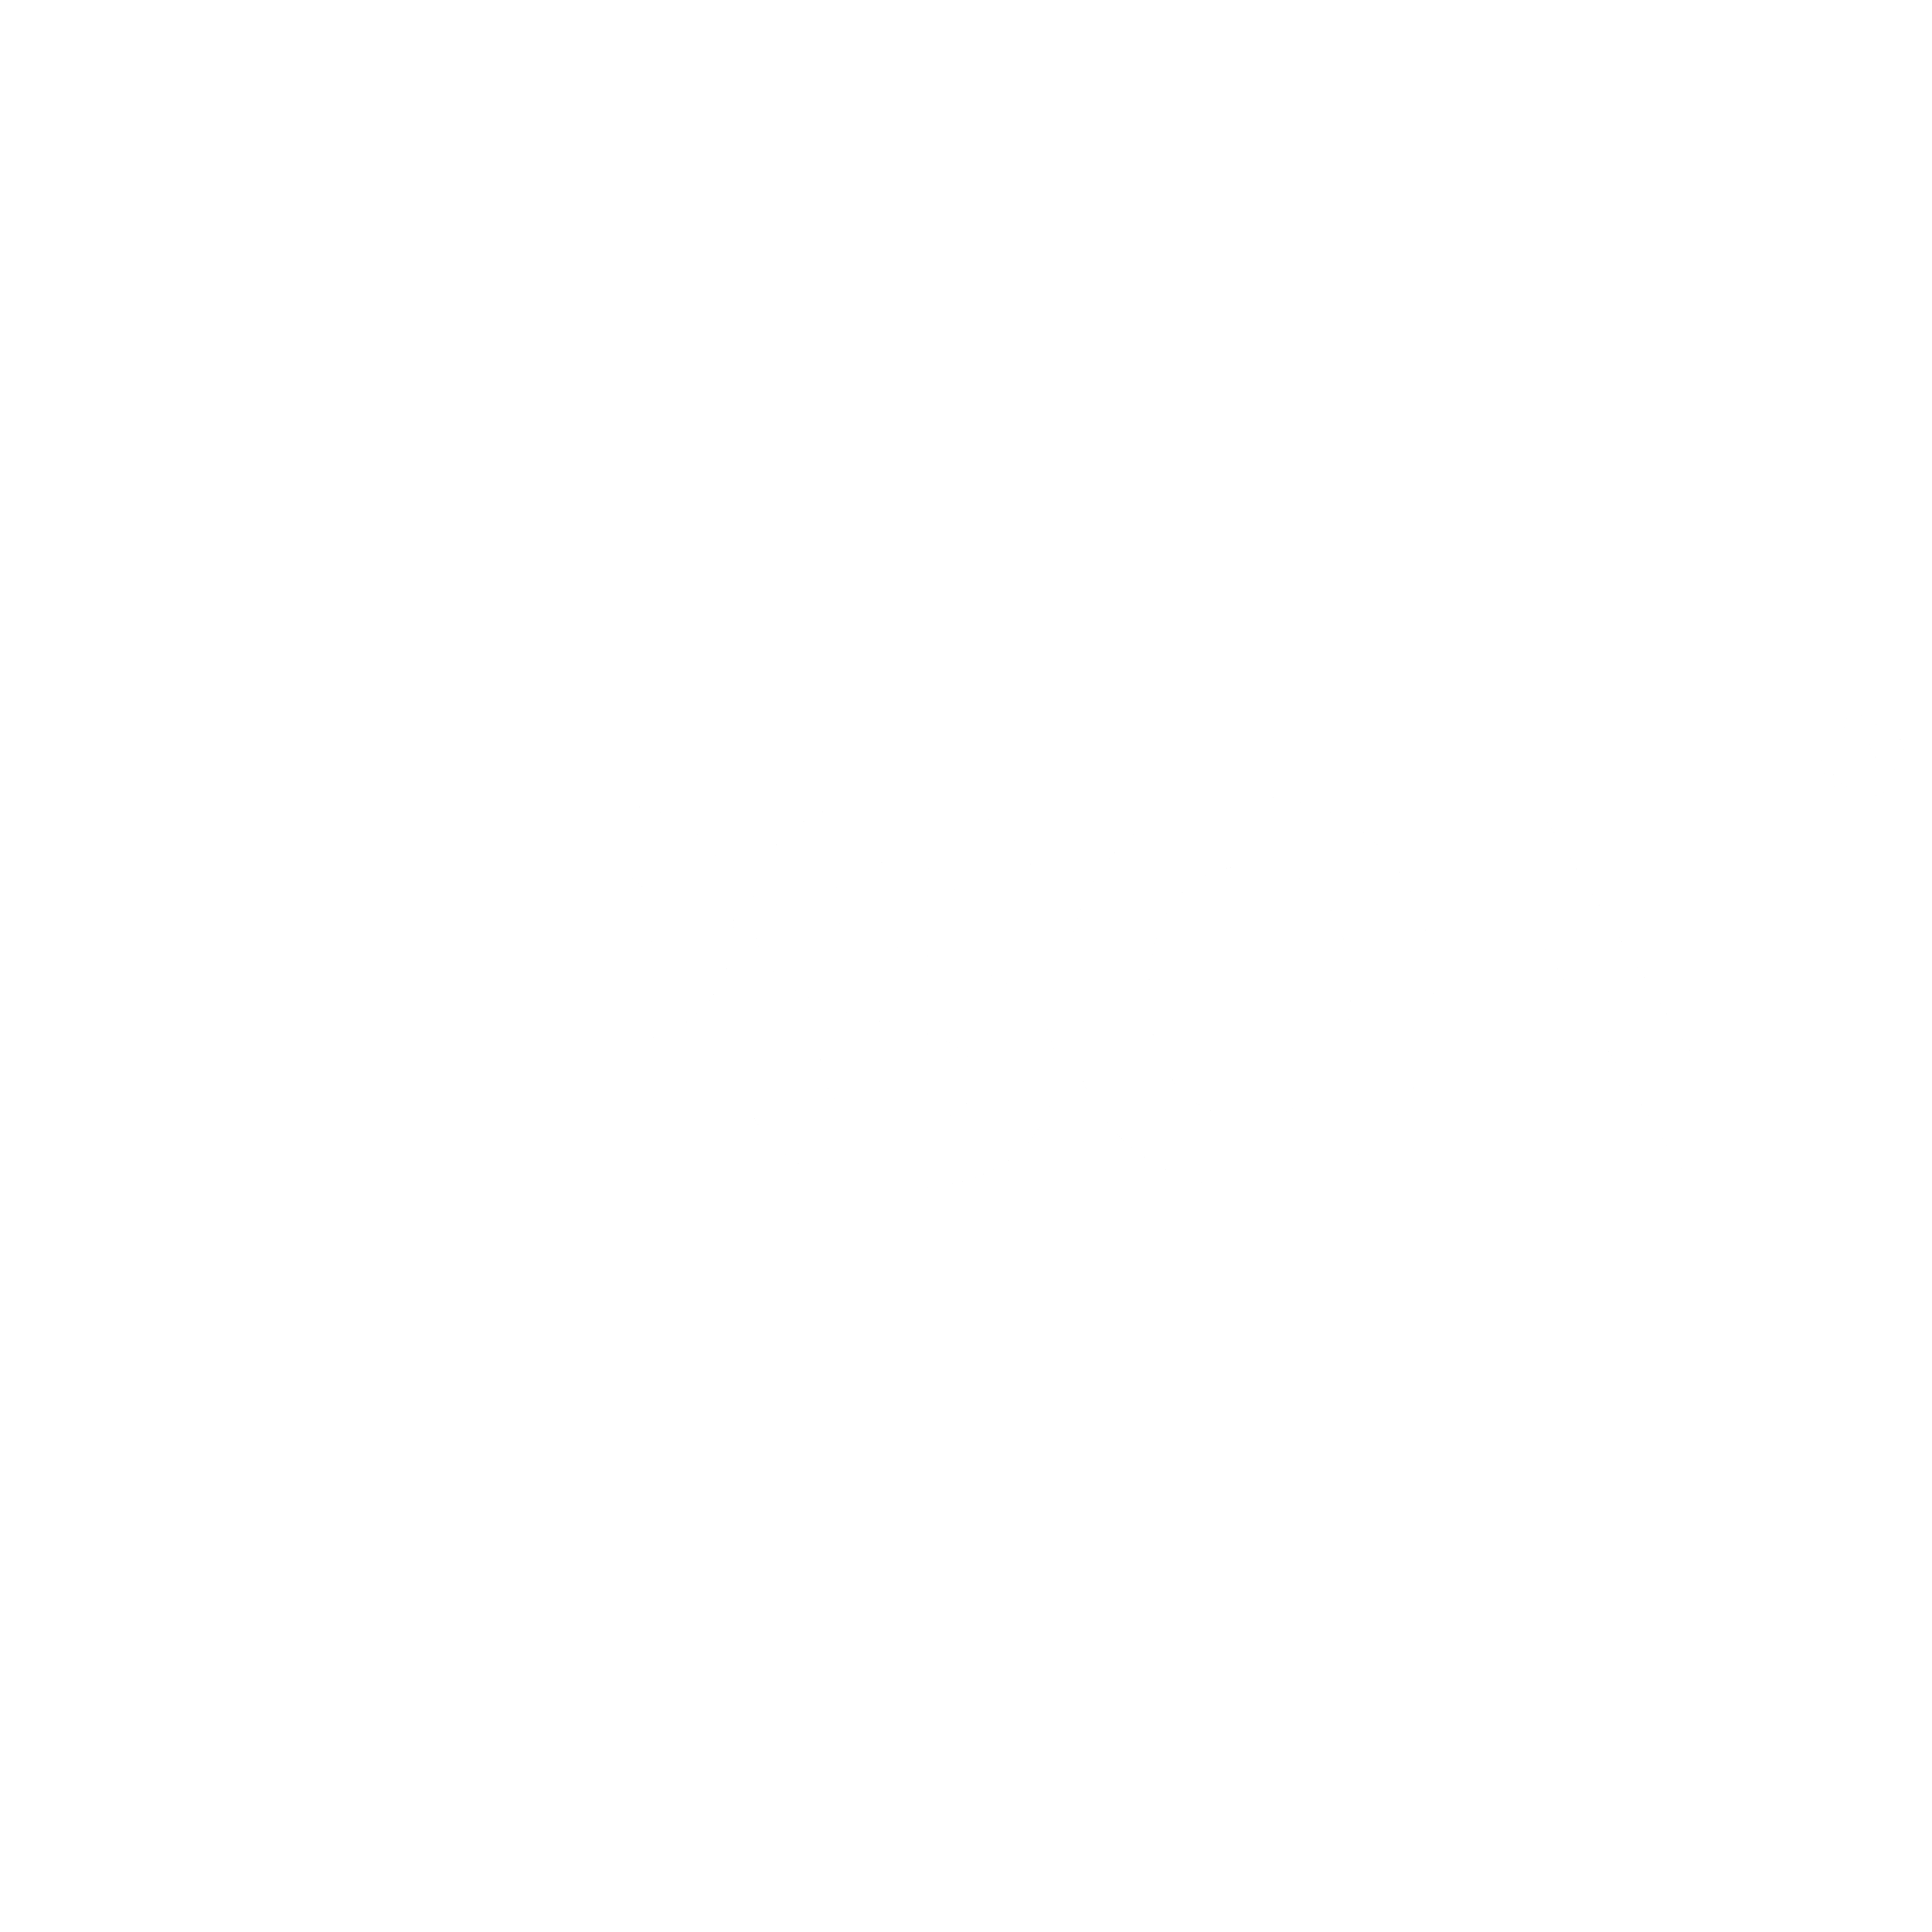 Epson Logo Png Transparent & Svg Vector - Pluspng Pluspng.com - Epson Logo PNG